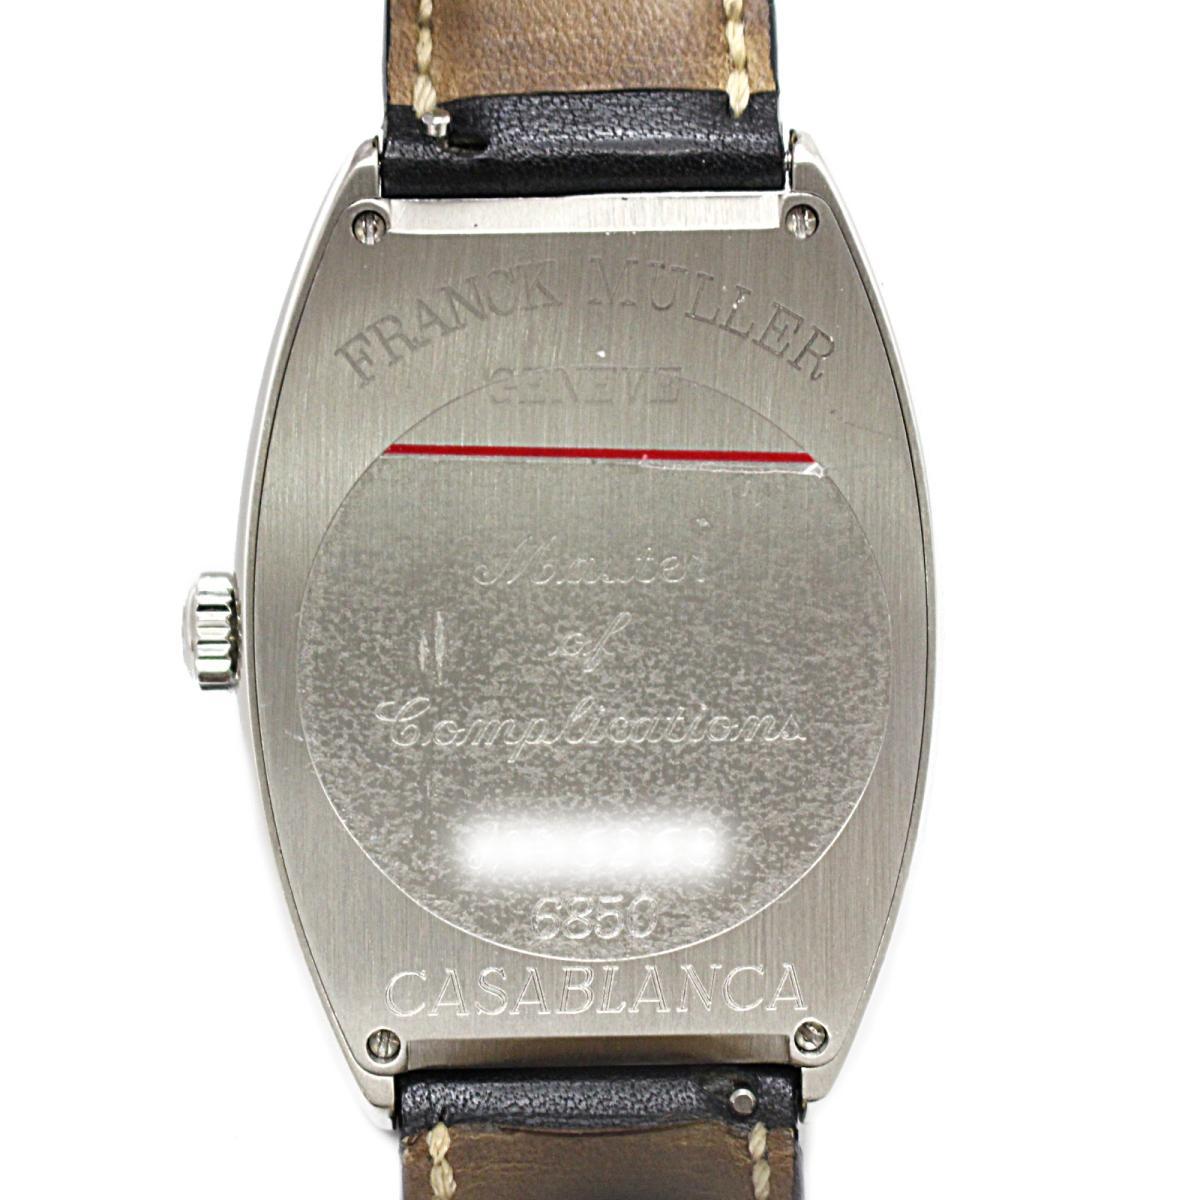 FRANCK MULLER 時計 6850 カサブランカ メンズウォッチ 腕時計/人気/SALE/お買得品